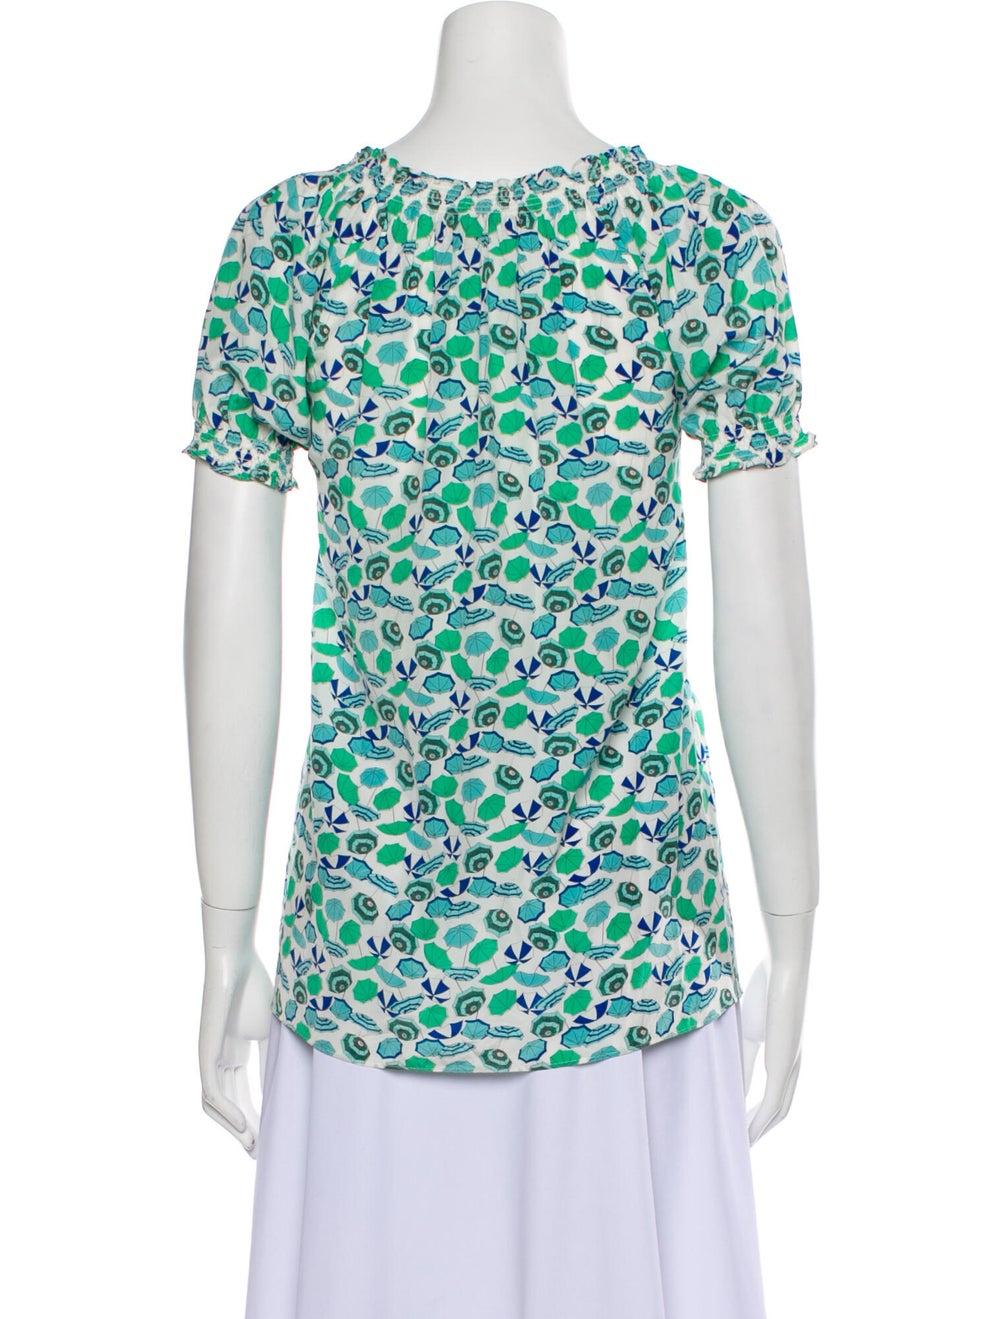 Joie modele Silk T-Shirt Green - image 3